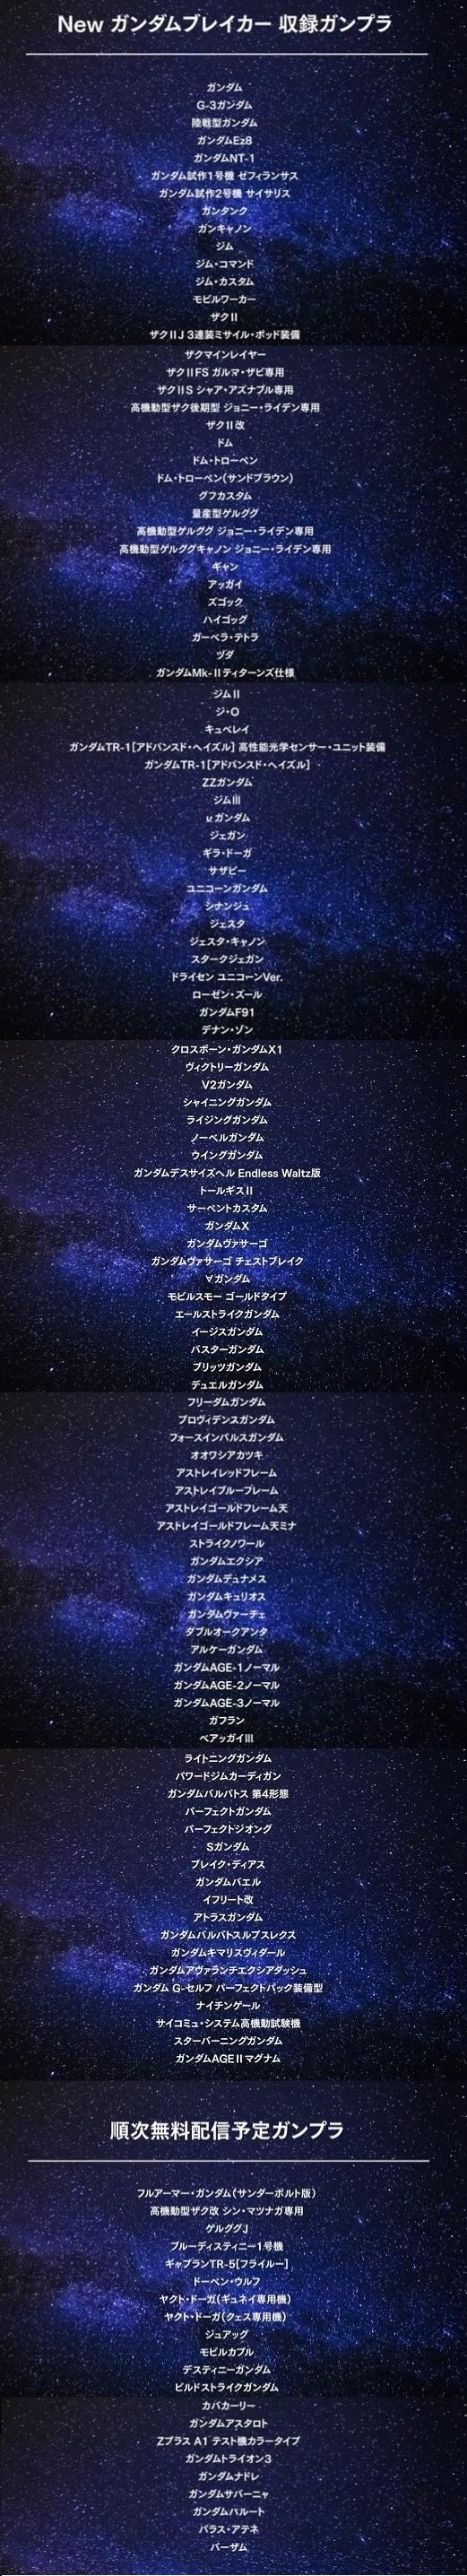 NGBSANlist01abb.jpg